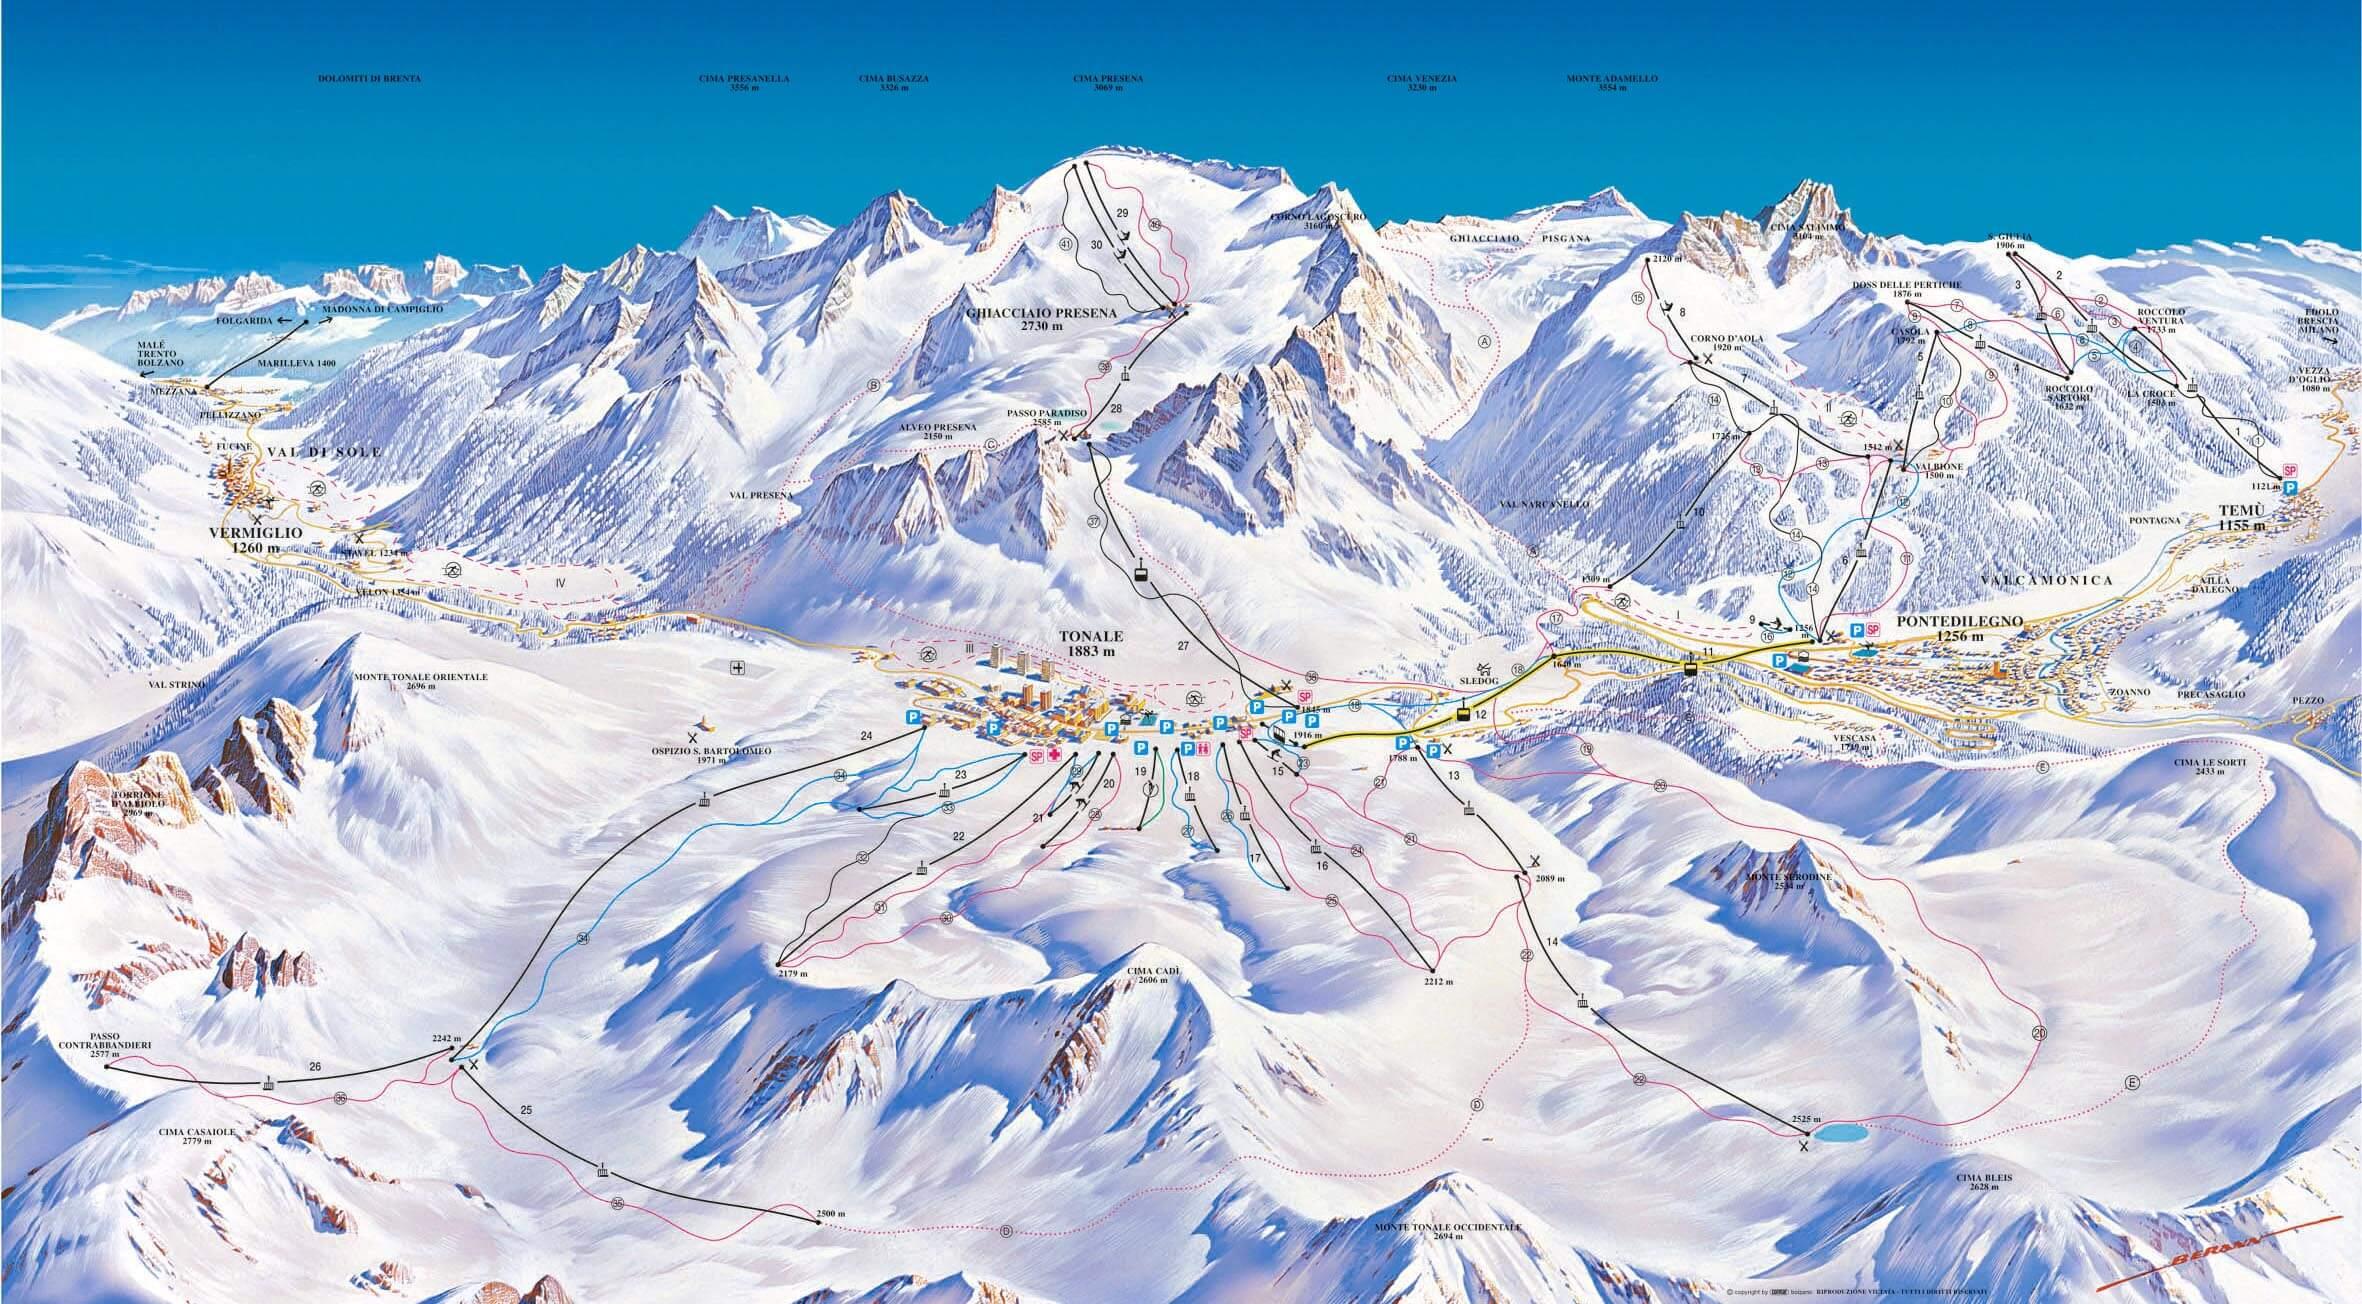 Pistes Map of Passo Tonale